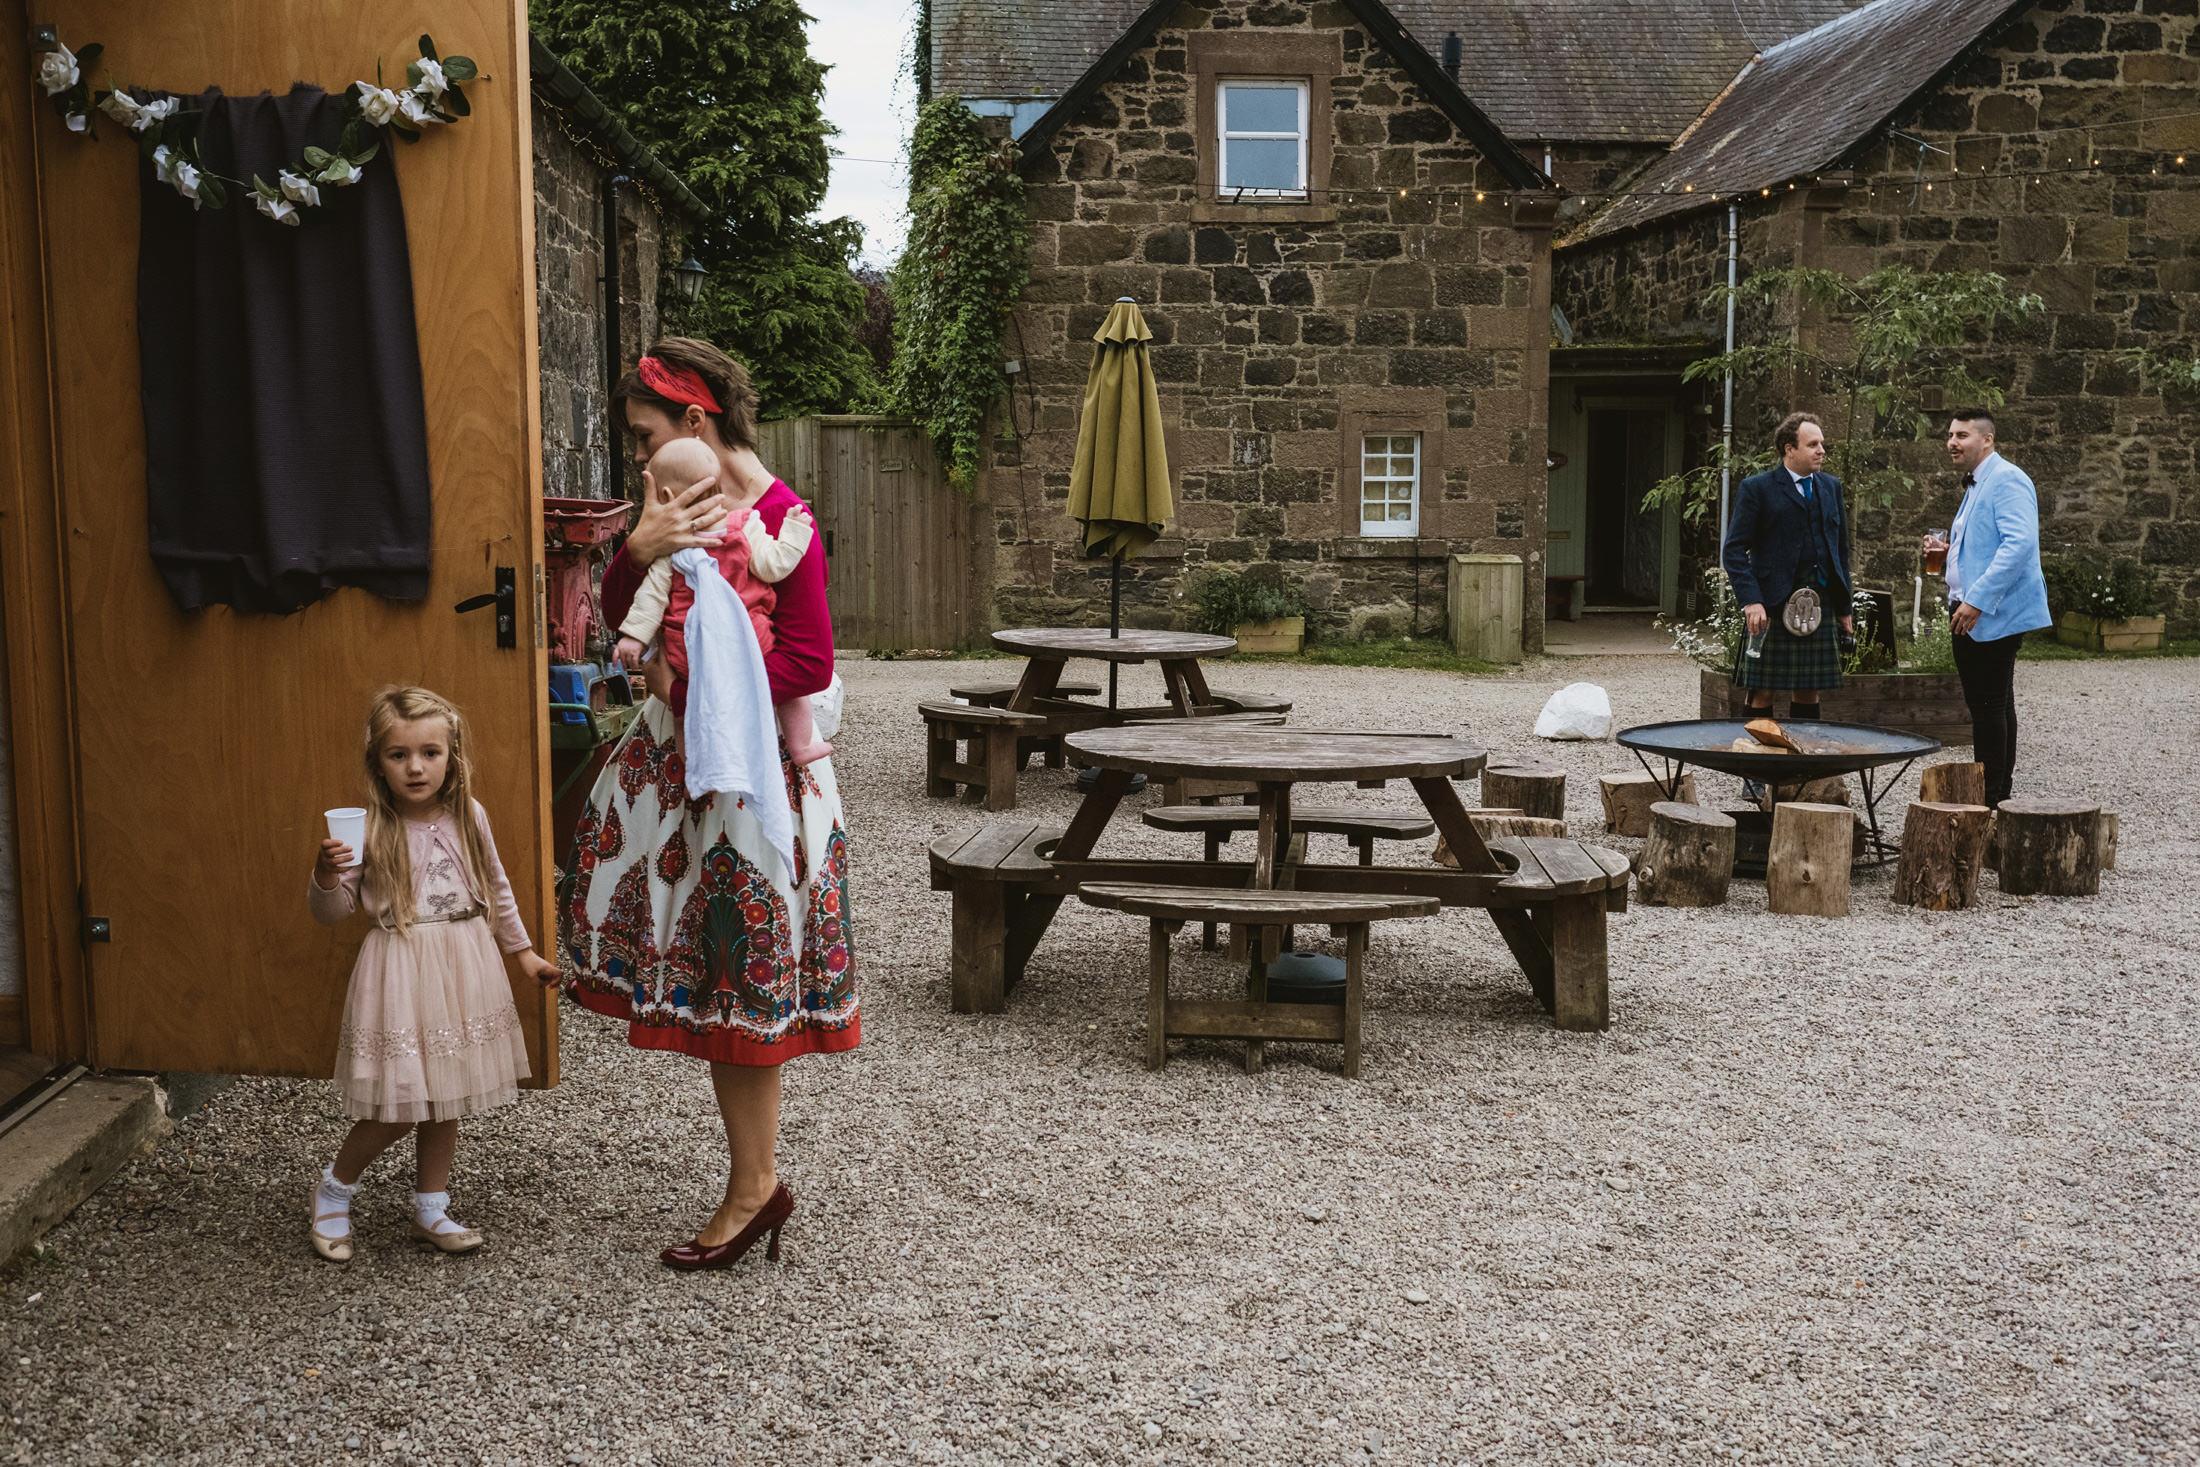 Comrie Croft wedding courtyard - documentary scene captured by York Place Studios